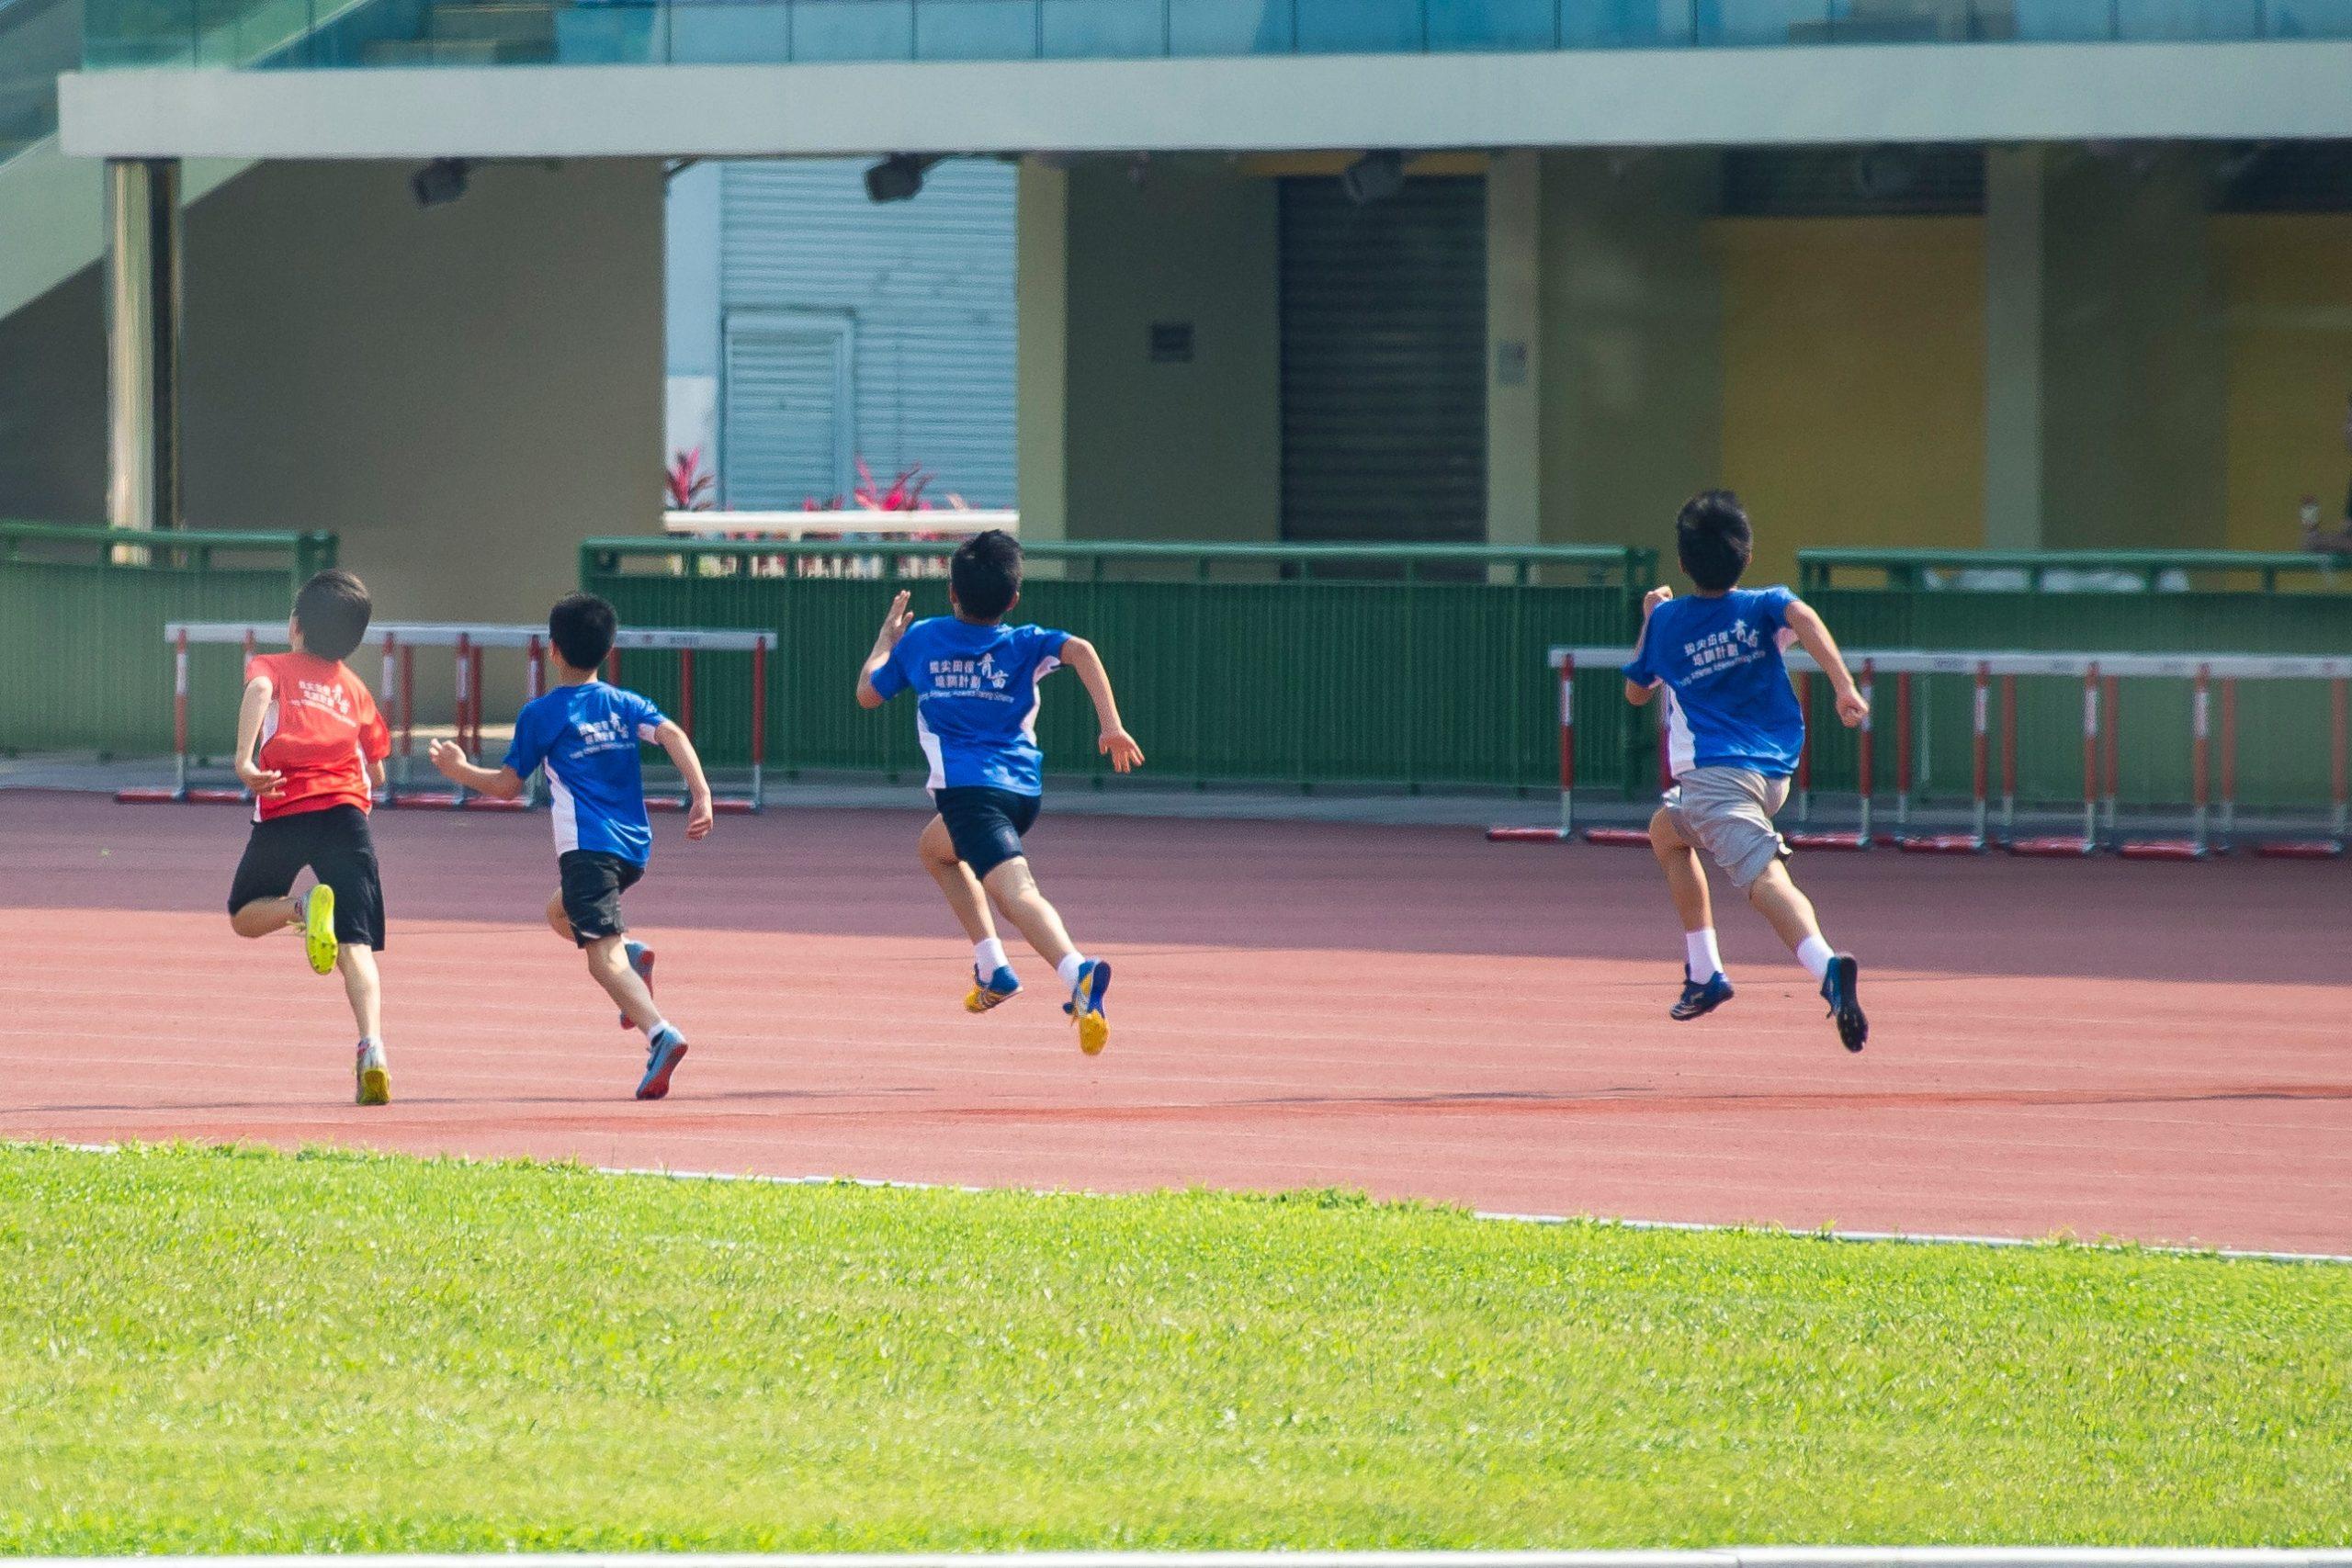 Kinderleichtathletik startet am 2. September 2021